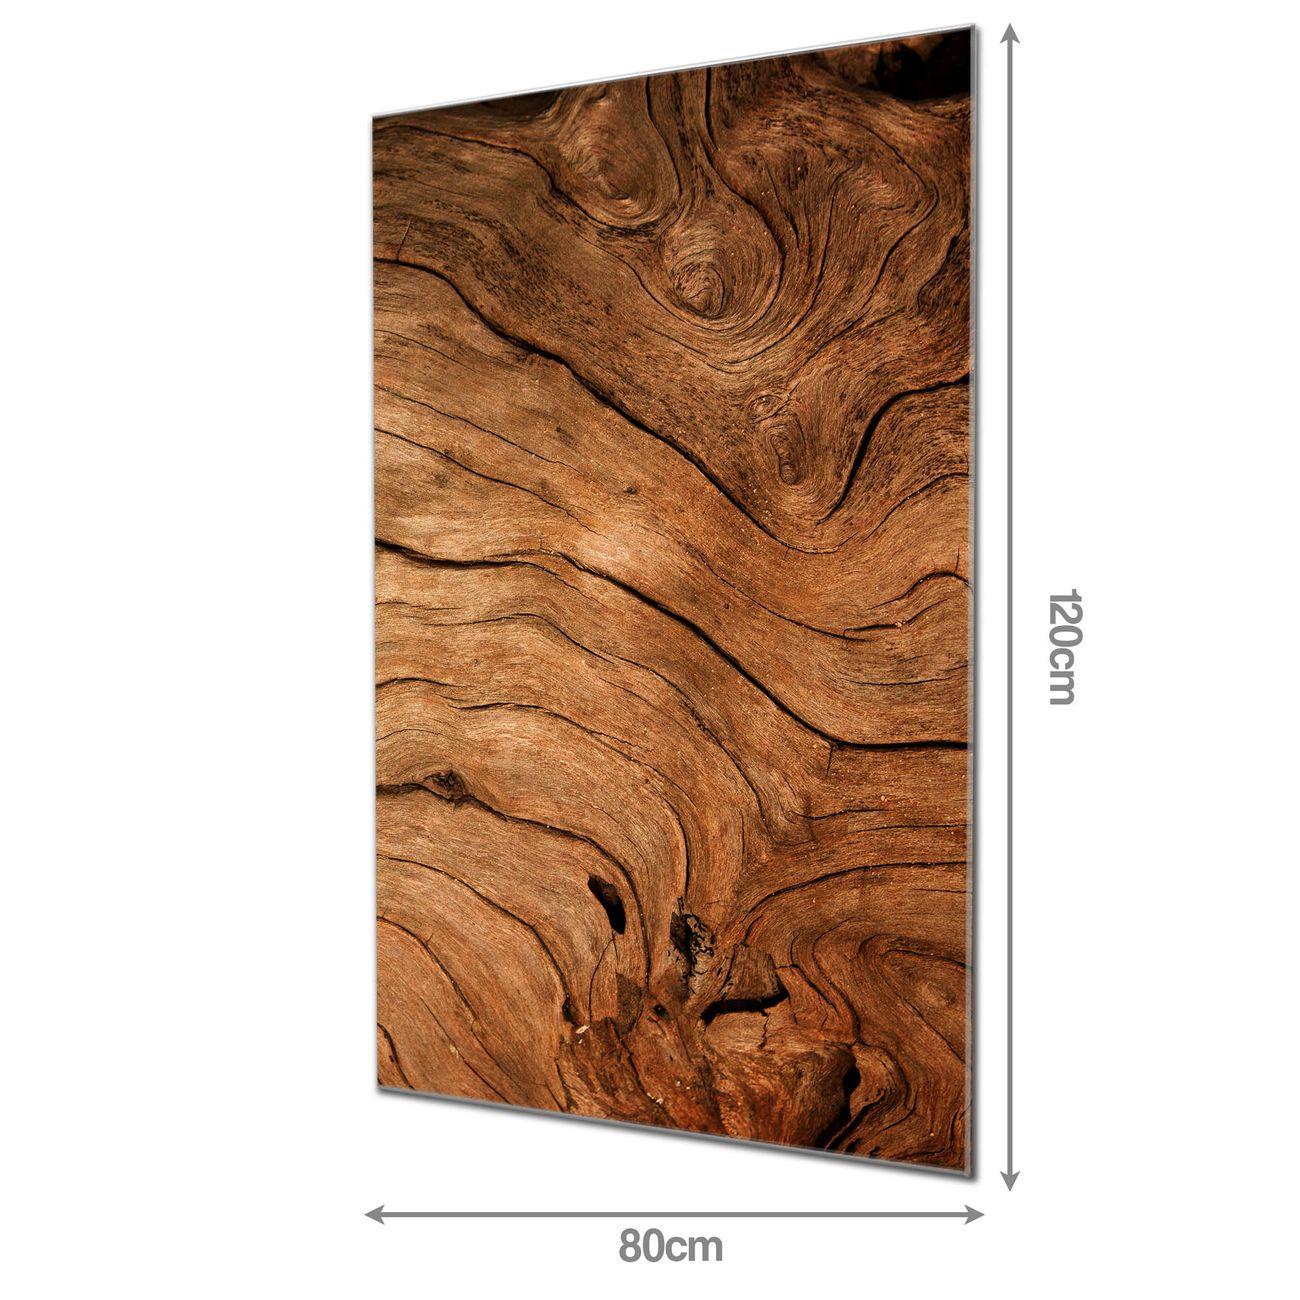 Glas Magnettafel im Hochformat Trockenes Holz